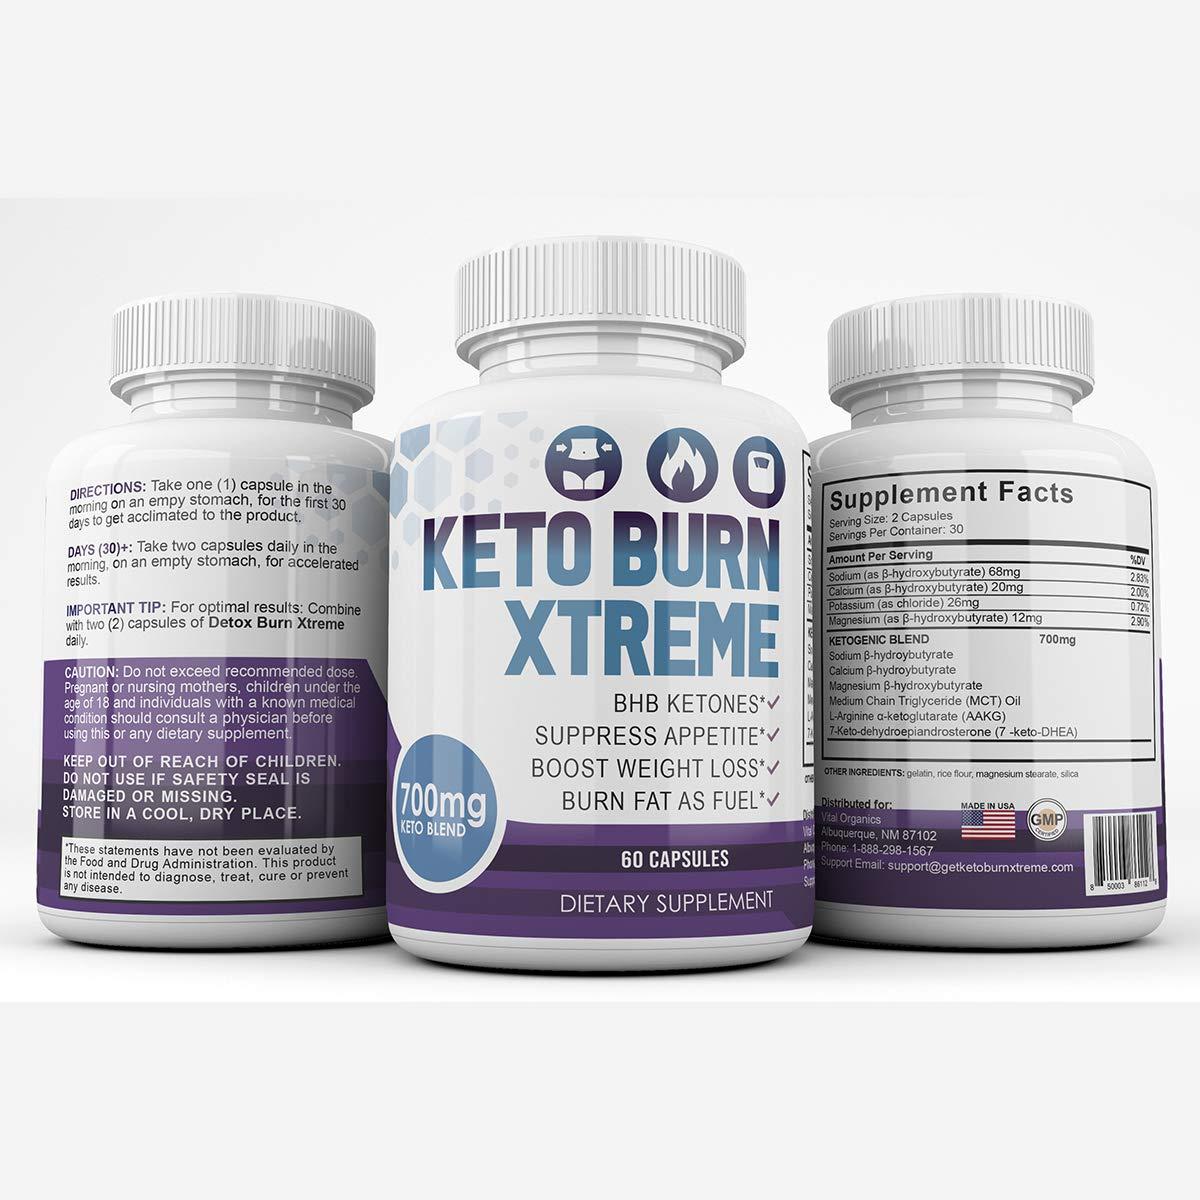 Keto Burn Xtreme - BHB Ketones - Suppress Appetite - Boost Weight Loss - Burn Fat As Fuel - 700mg Keto Blend - 30 Day Supply by Keto Burn Xtreme (Image #7)